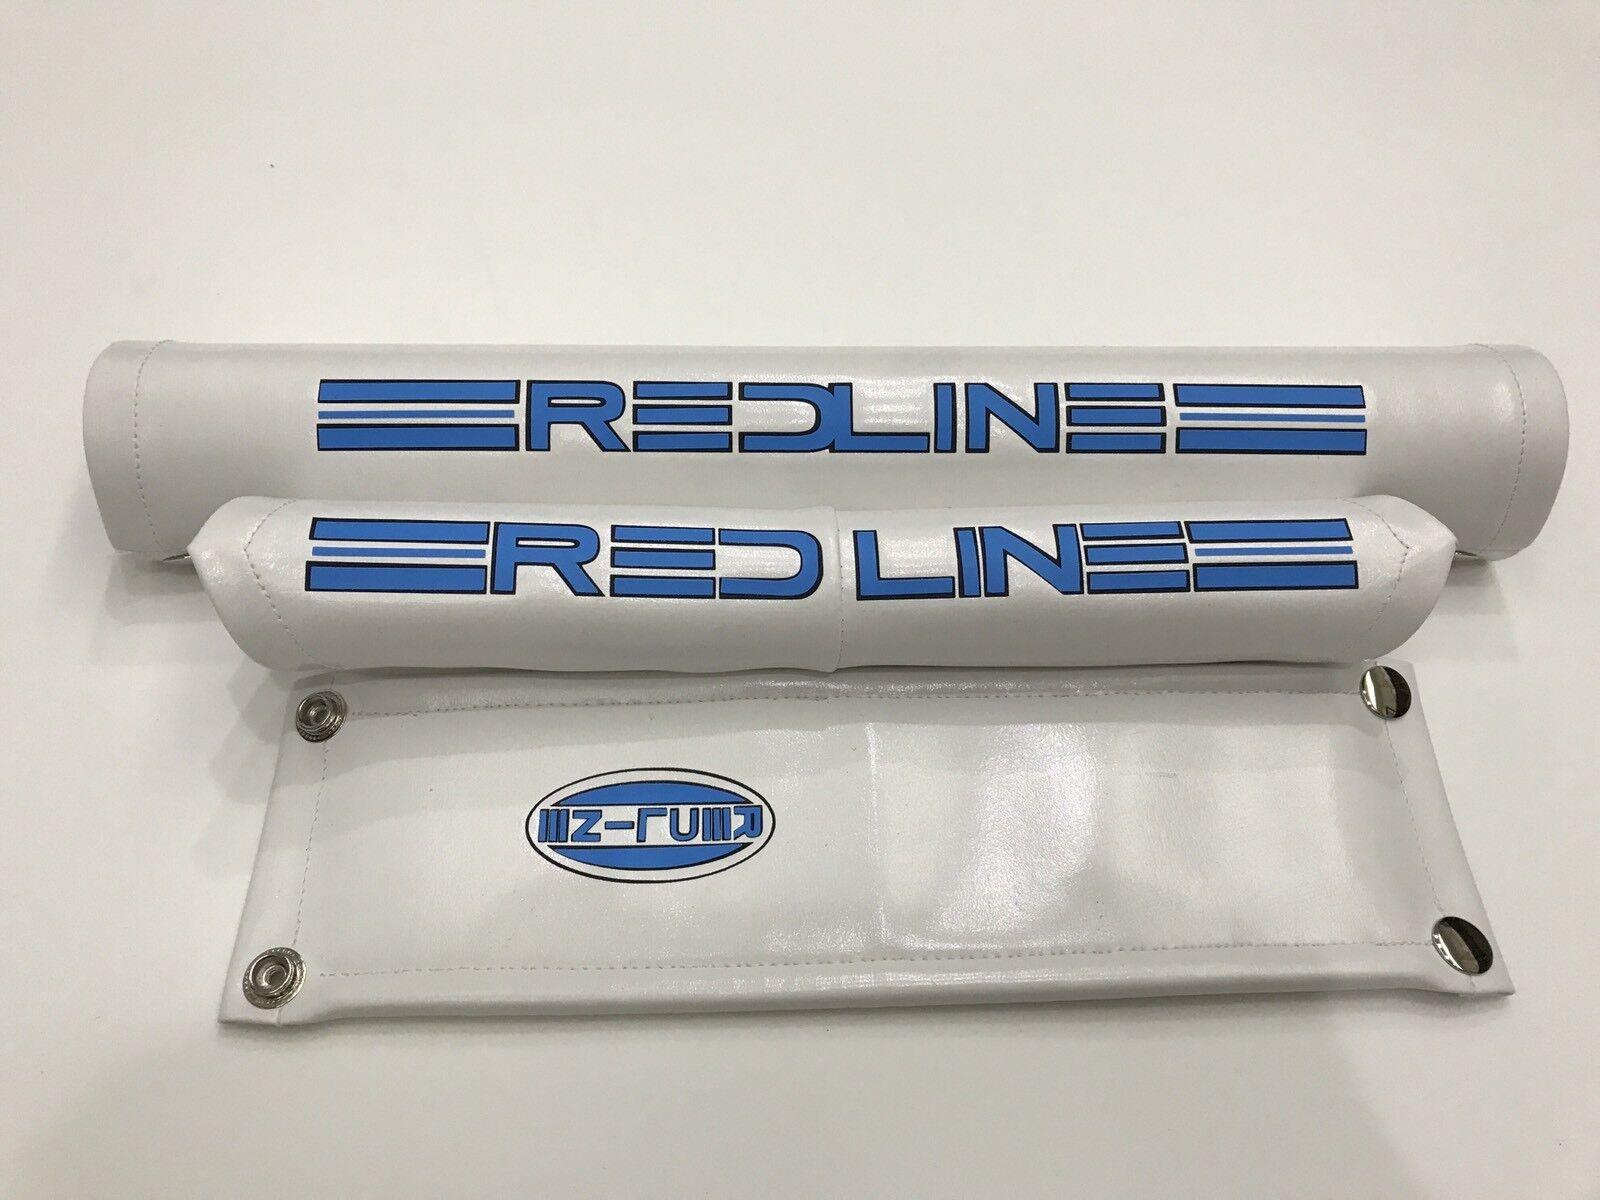 RossoLINE PROLINE Vstyle MX2 VINYL Pad Set Ripper Oldschool Bmx REPOP Sky blu